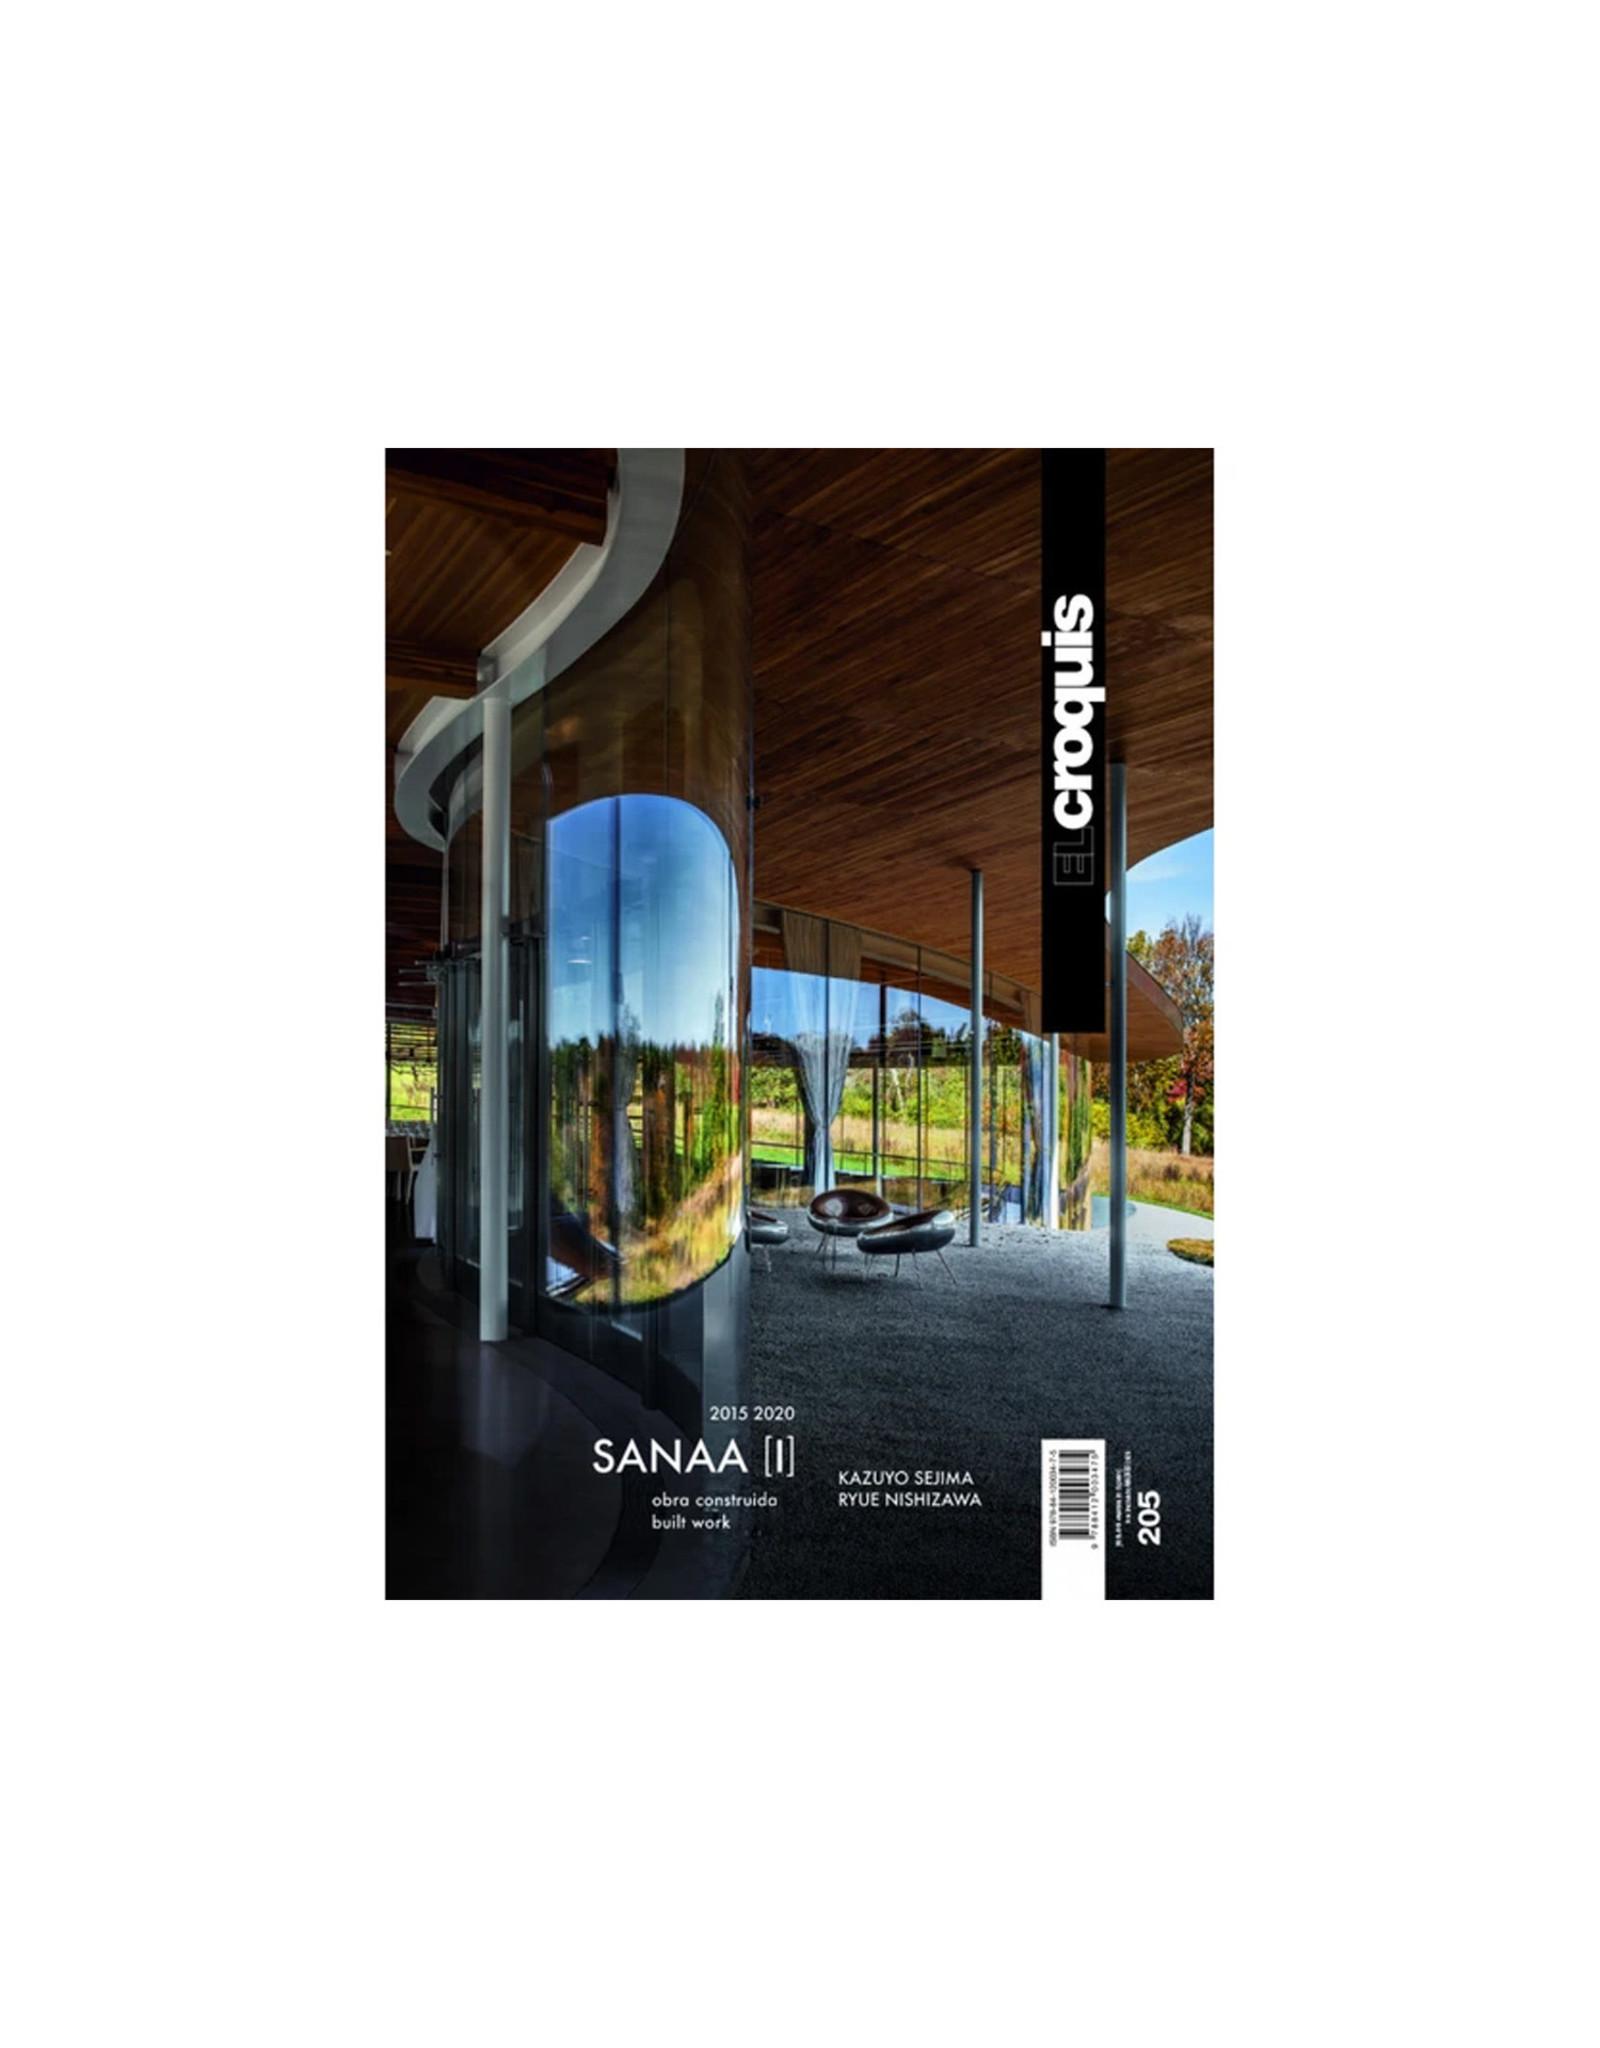 El Croquis 205: Sanaa (2015-2020)